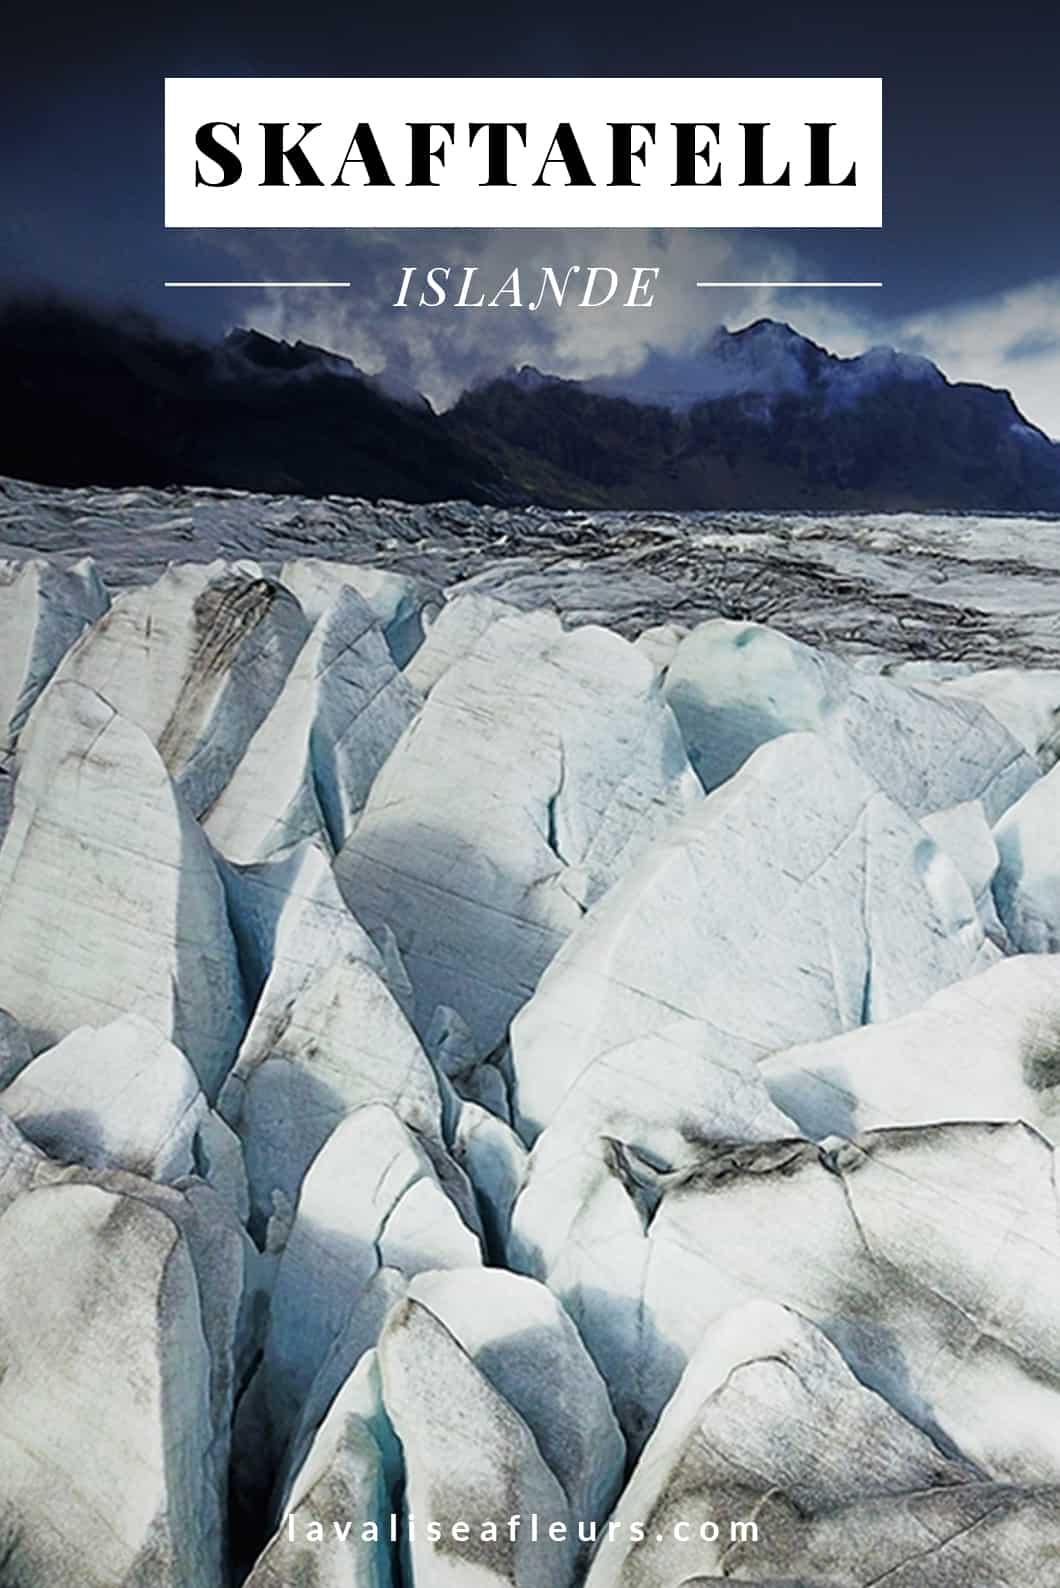 Visiter le Parc national de Skaftafell en Islande